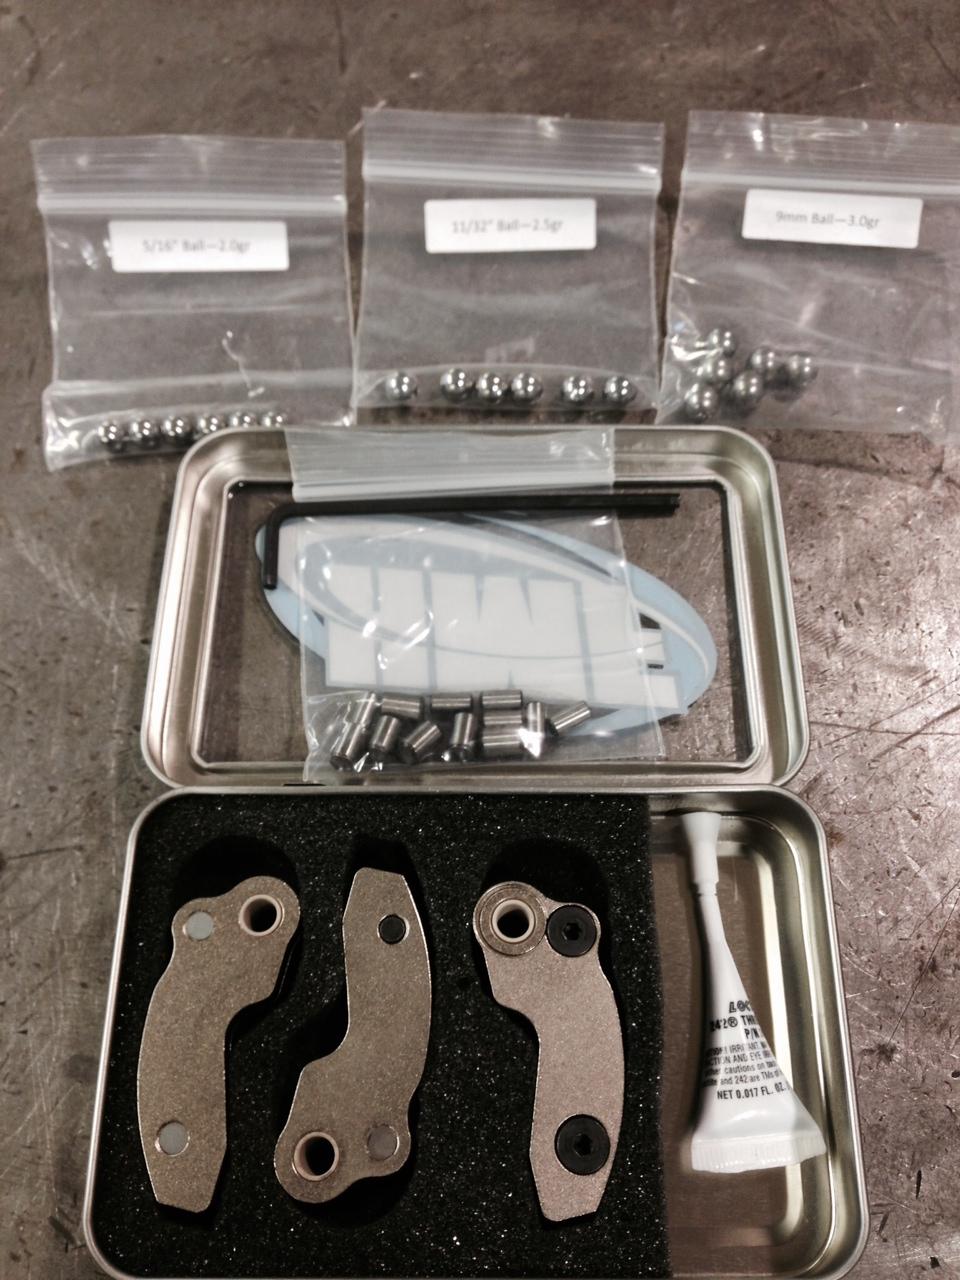 Utv Clutch Kits : Hmf clutch kit